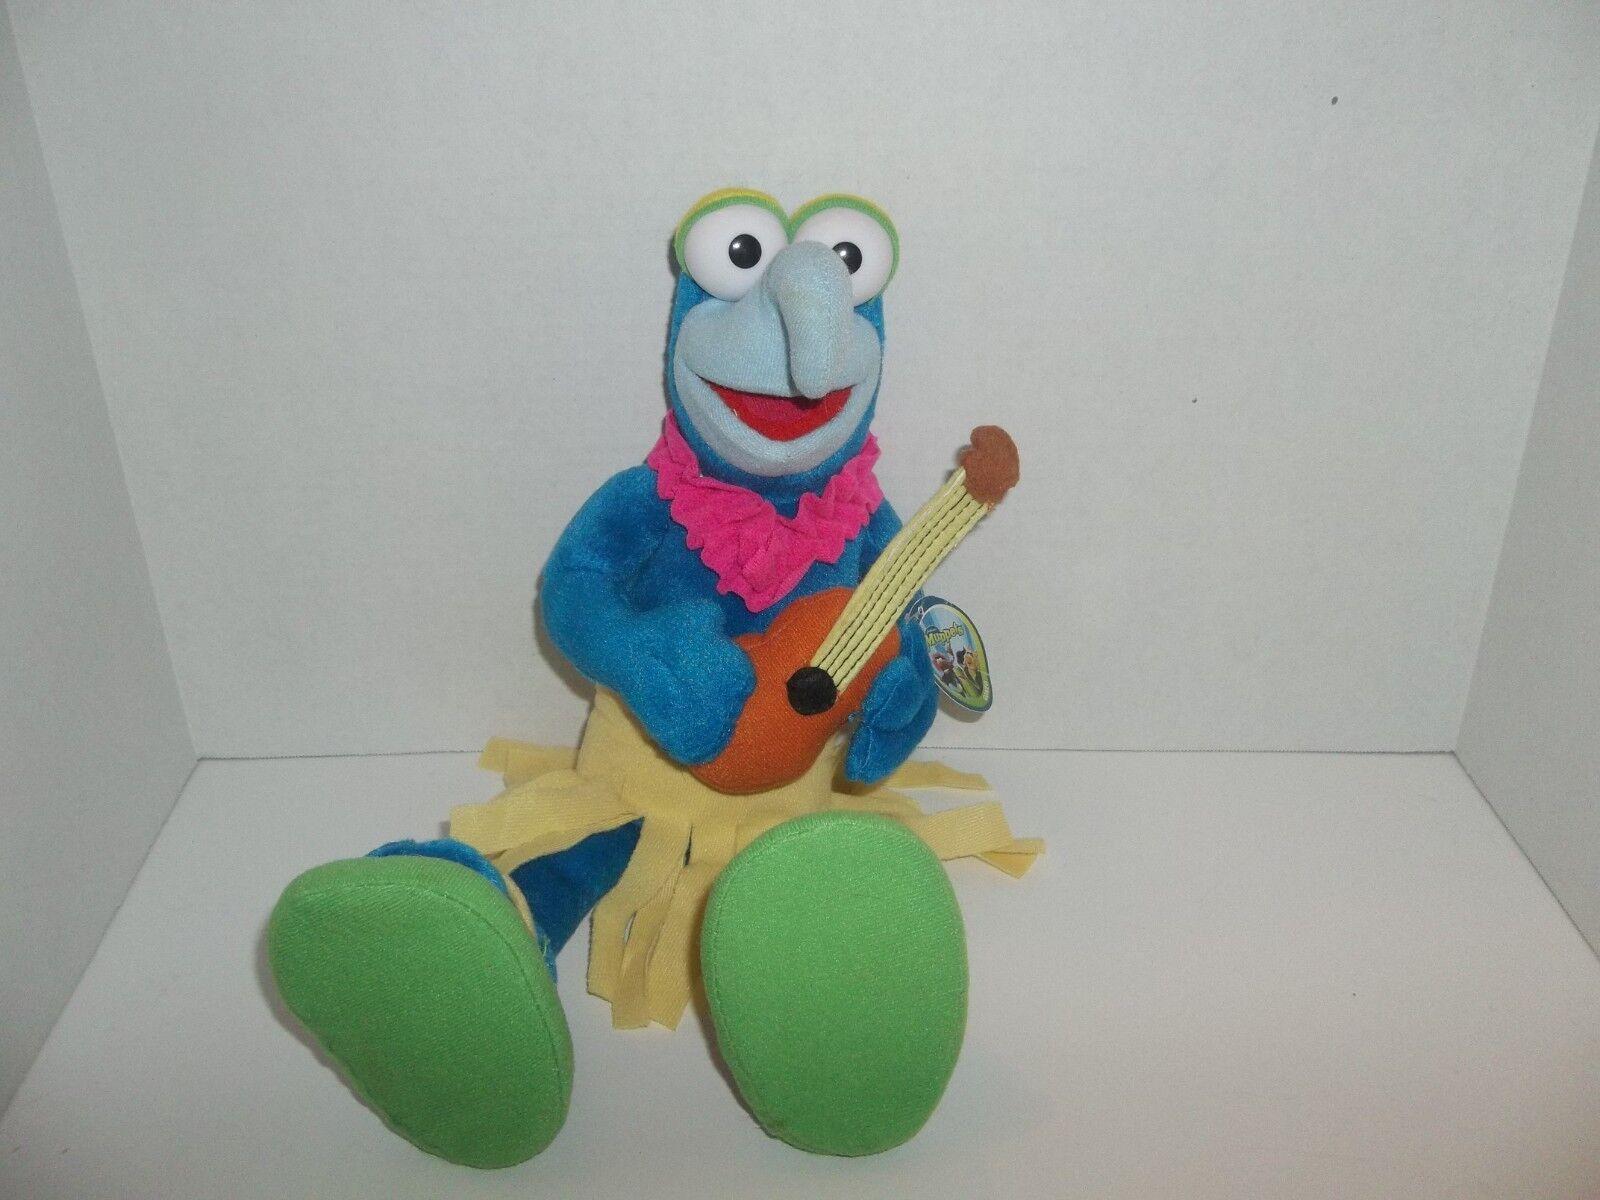 Nanco jim henson muppets hawaiian gonzo plush doll